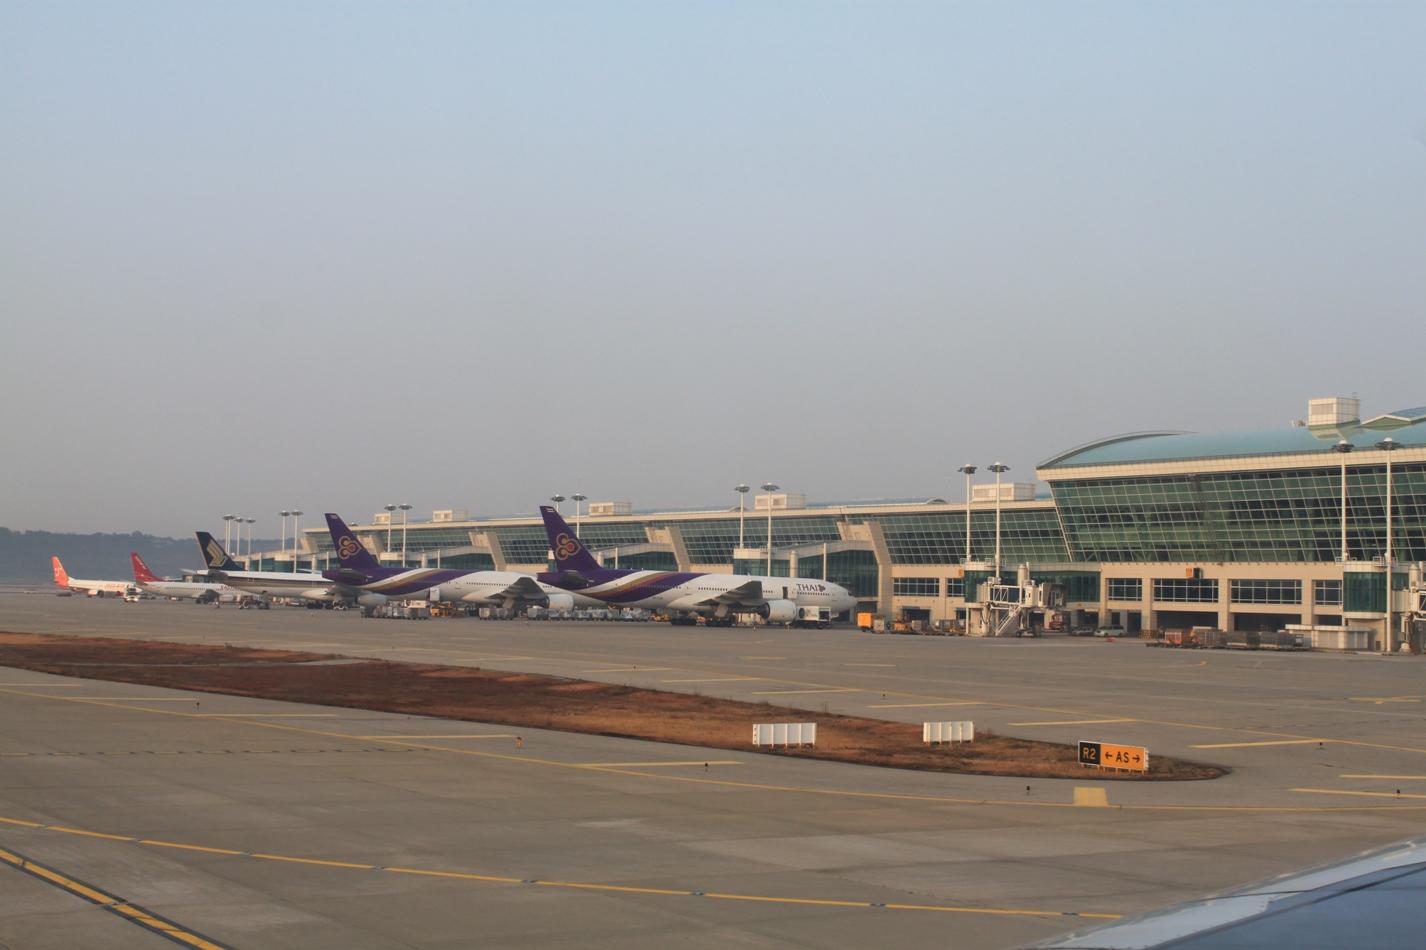 Пассажирский терминал аэропорта Сеул Инчхон